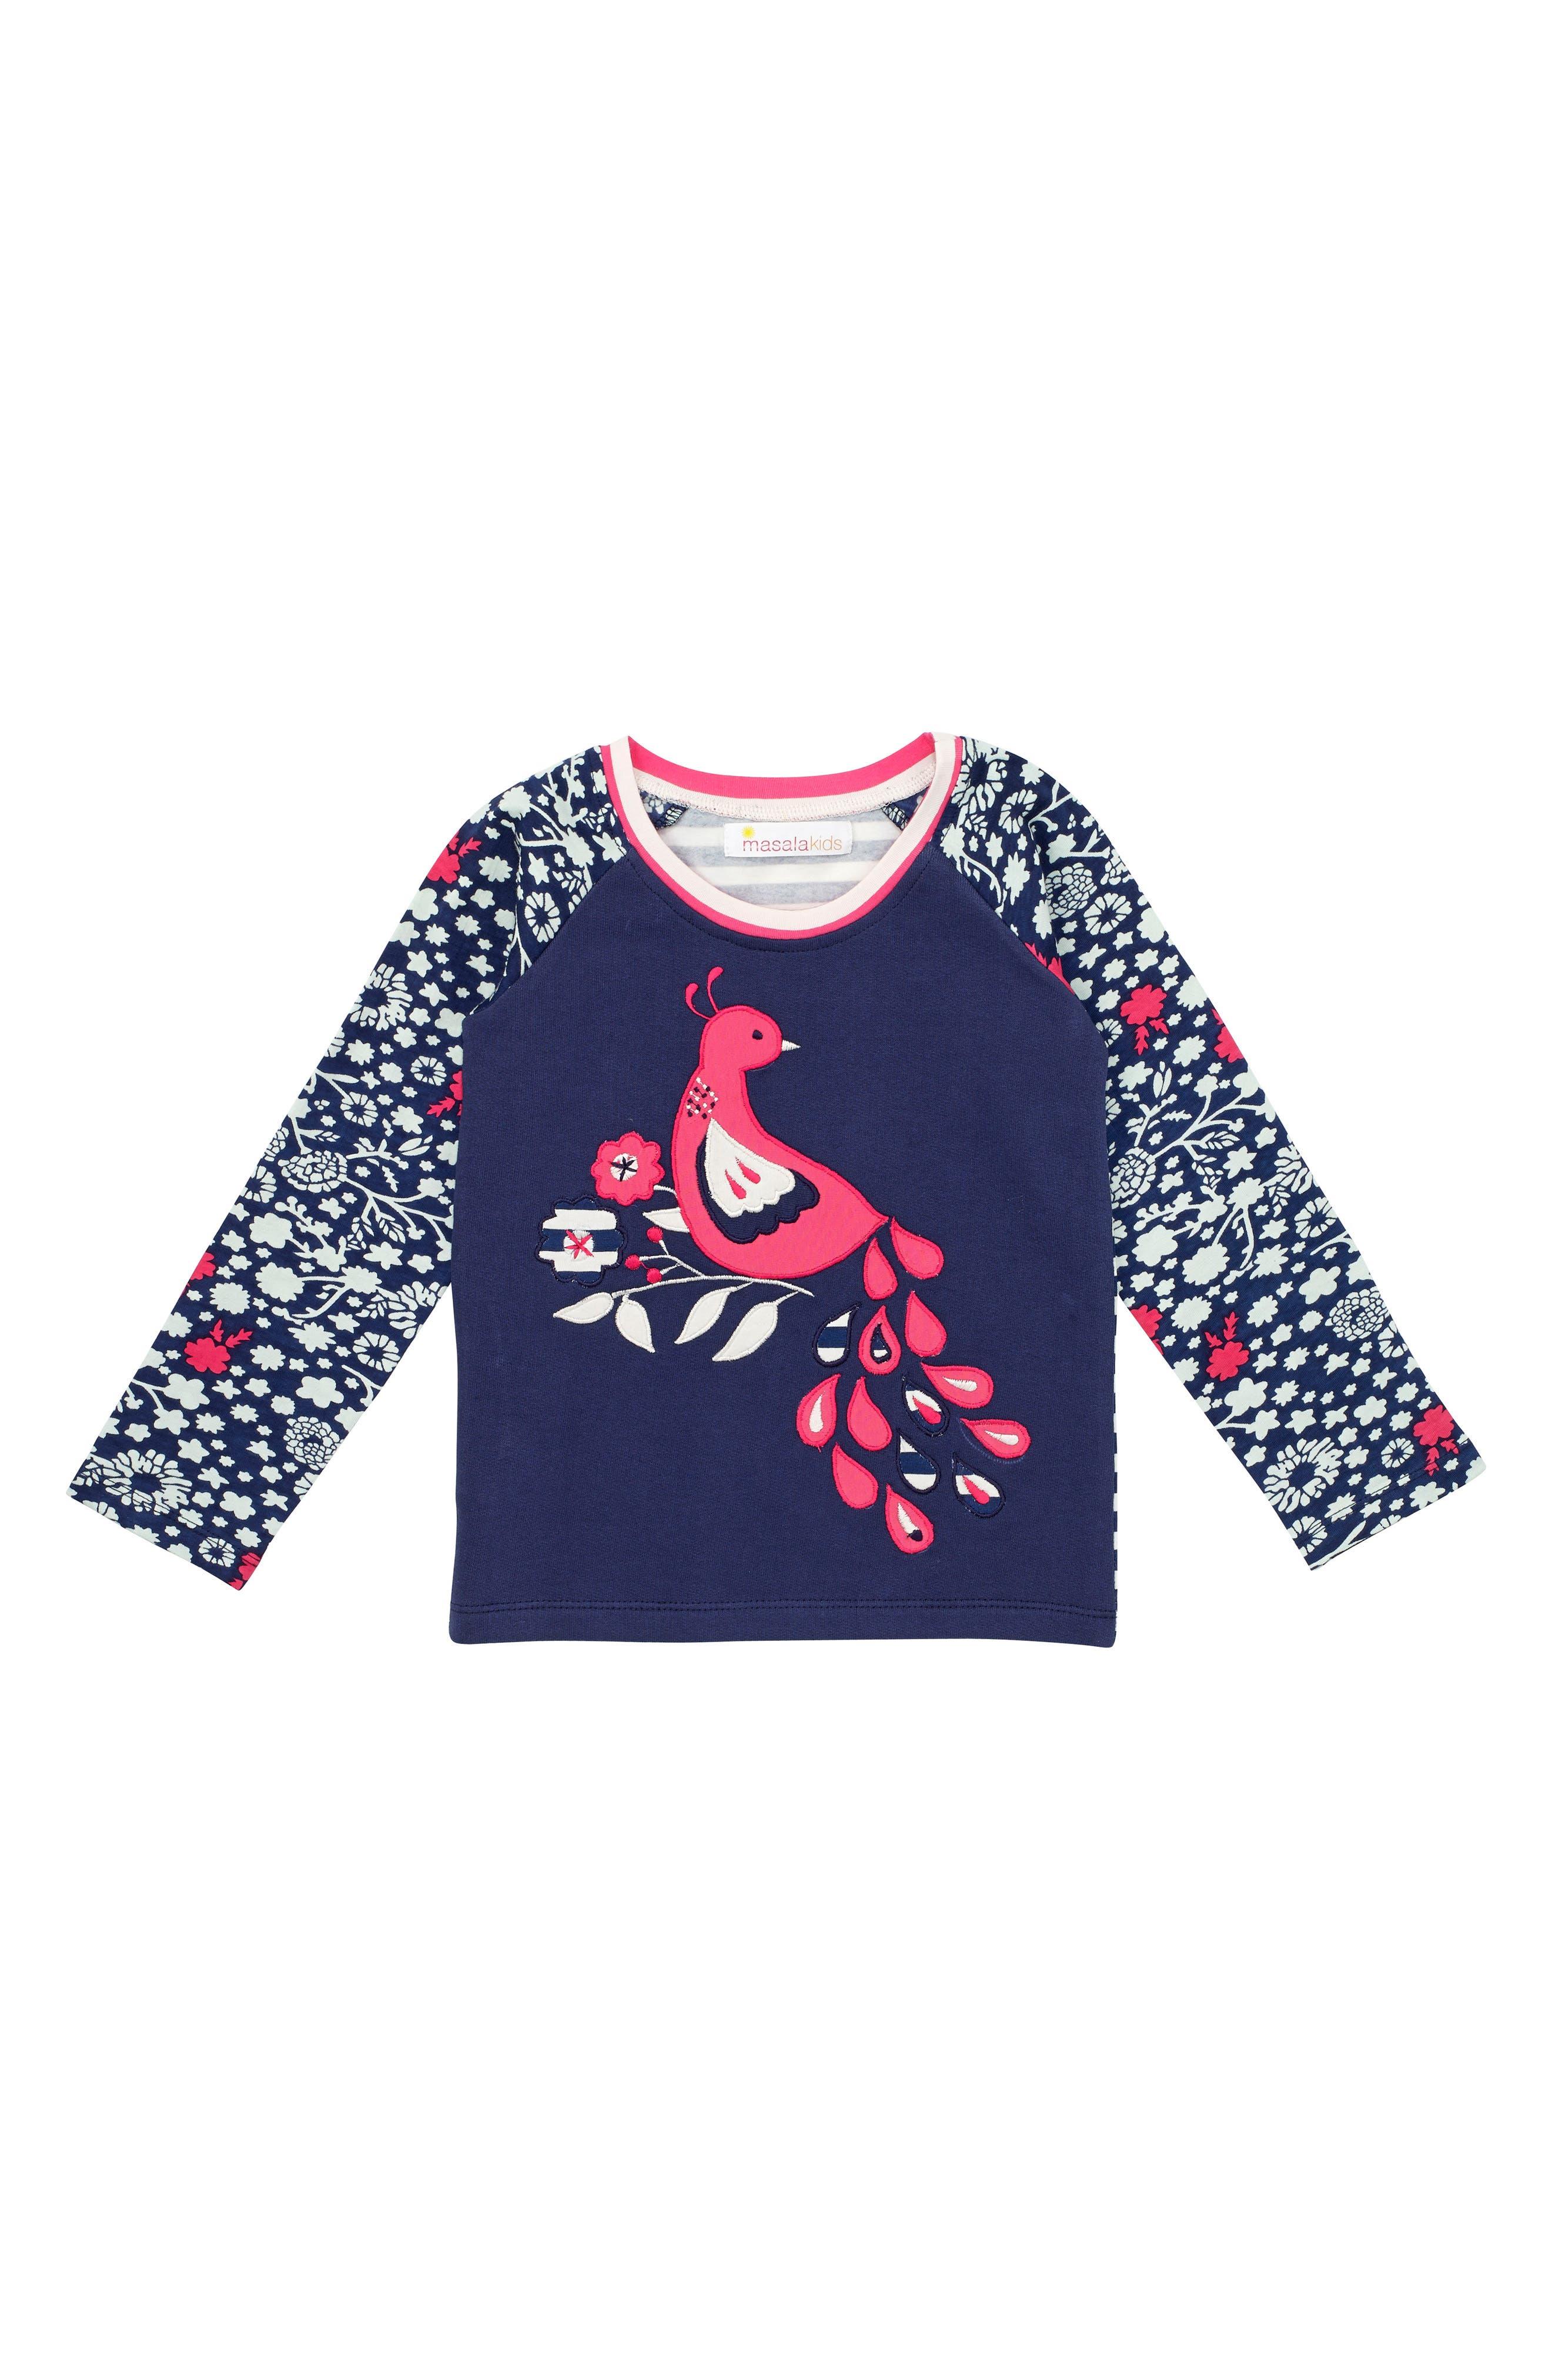 Main Image - Masasla Baby Dancing Peacock Appliqué Top (Toddler Girls, Little Girls & Big Girls)